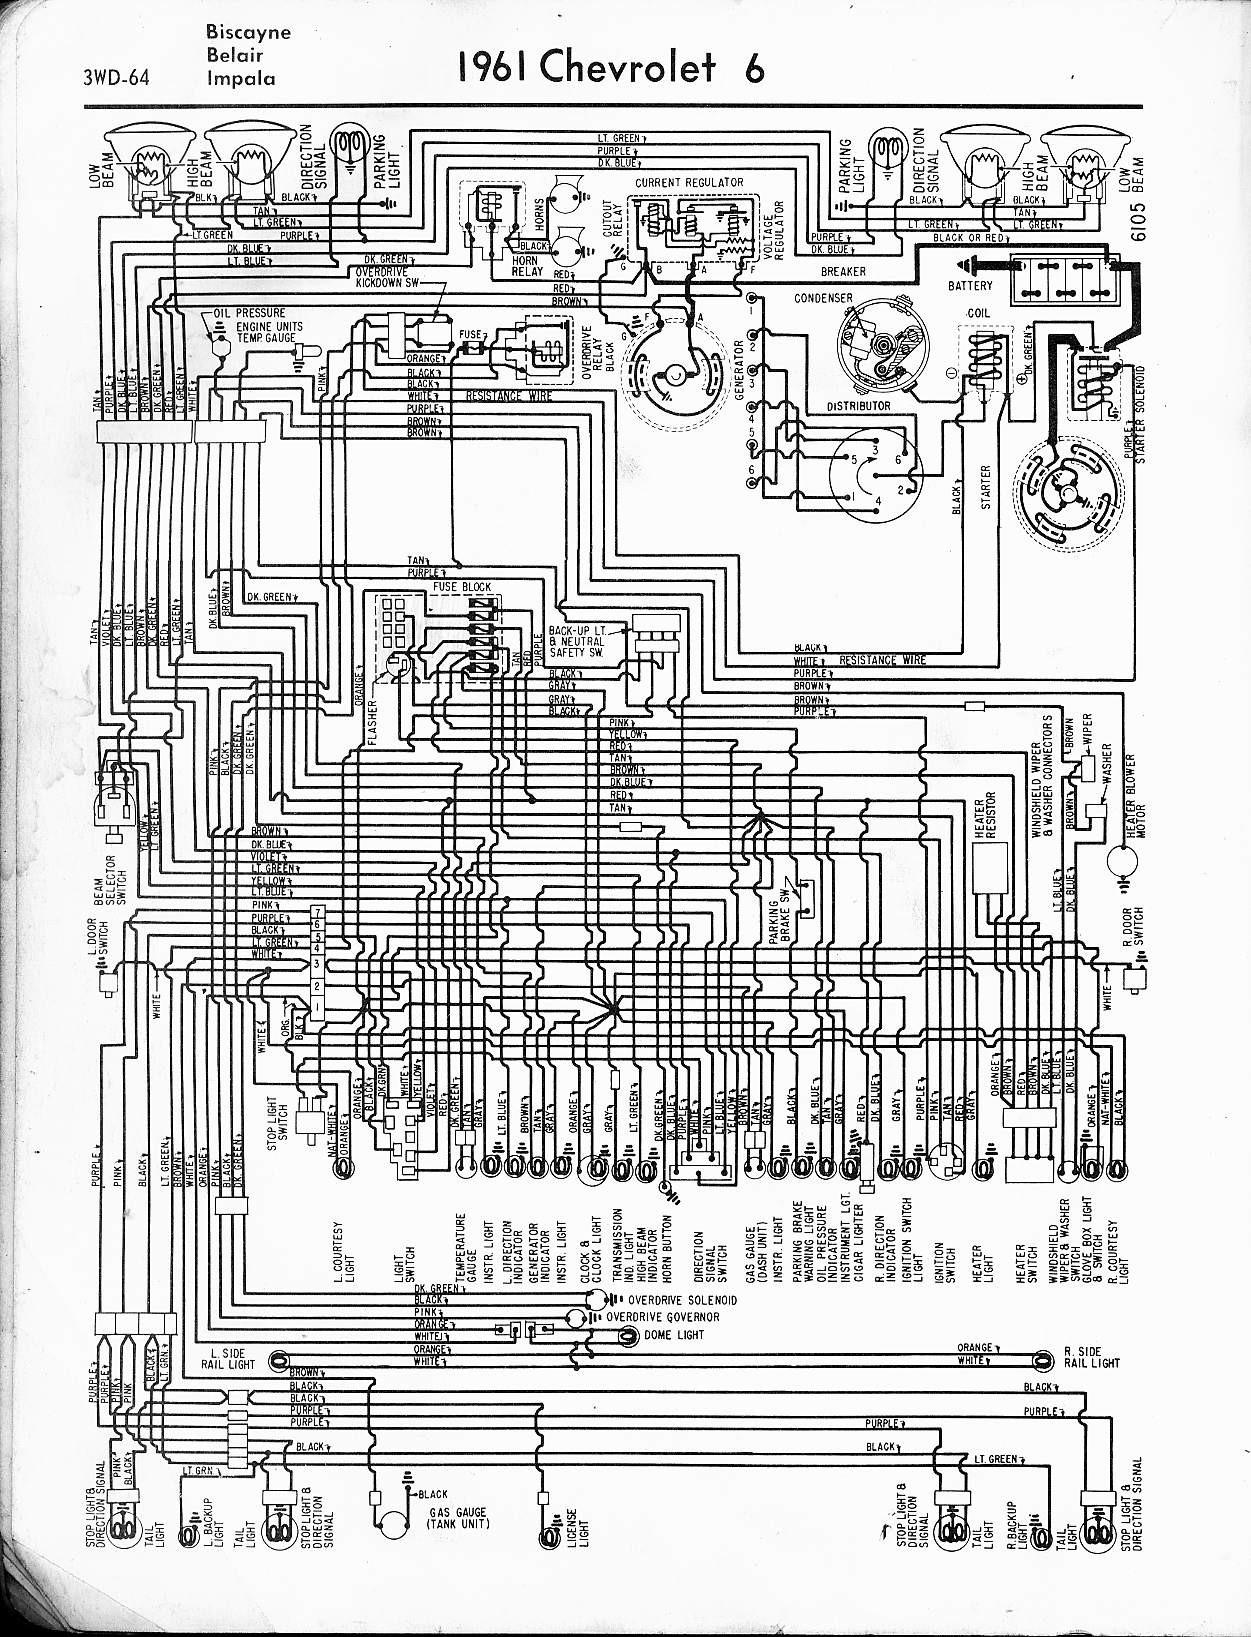 Snorkel Tb80 Wirreing Diagram | My Wiring DIagram